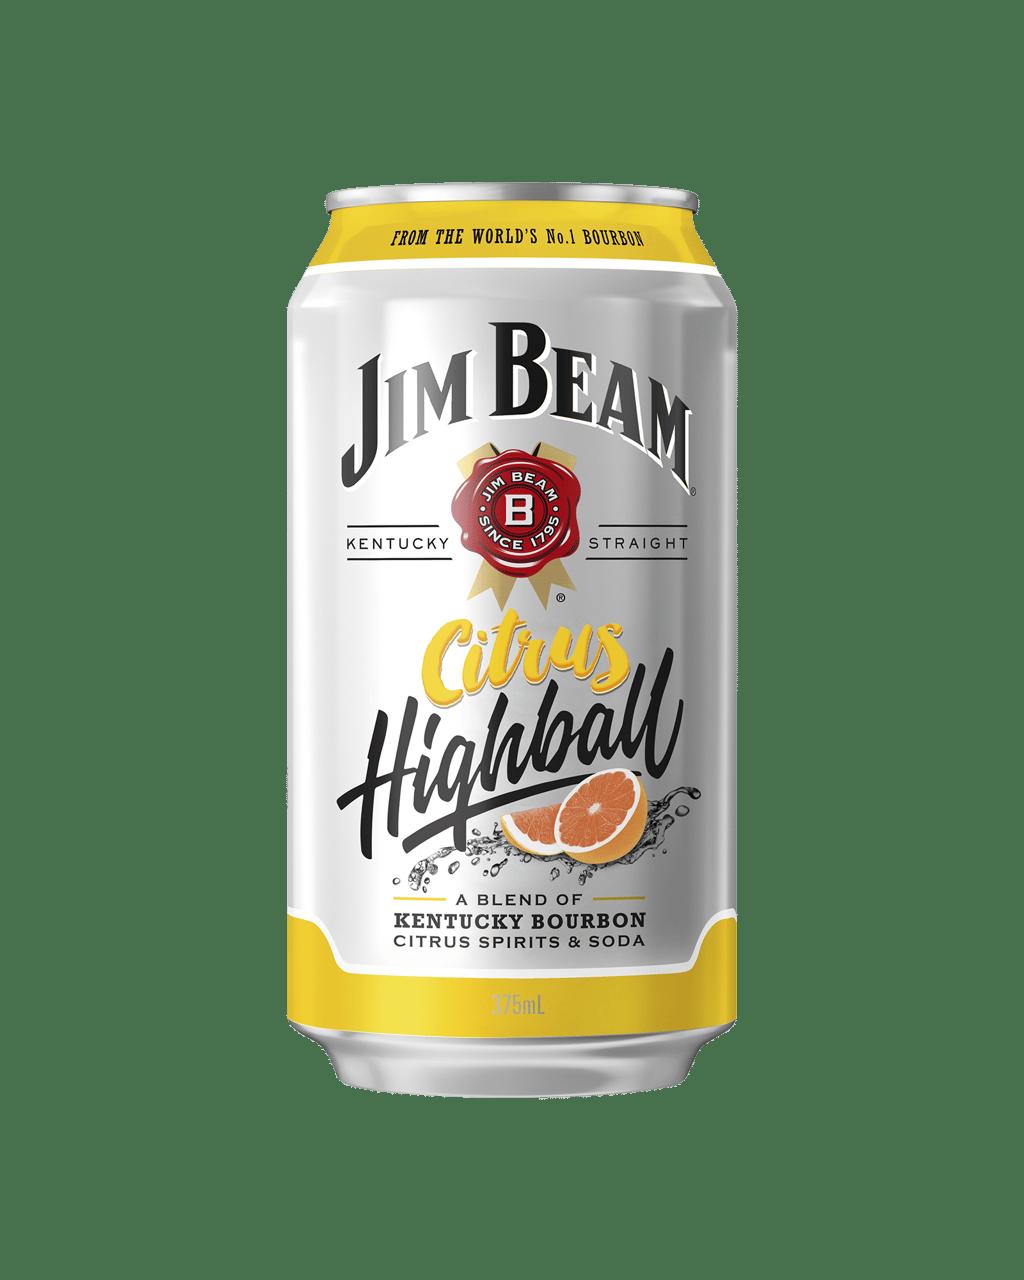 Jim Beam Citrus Highball Cans 375mL  bbf6c3e54d96